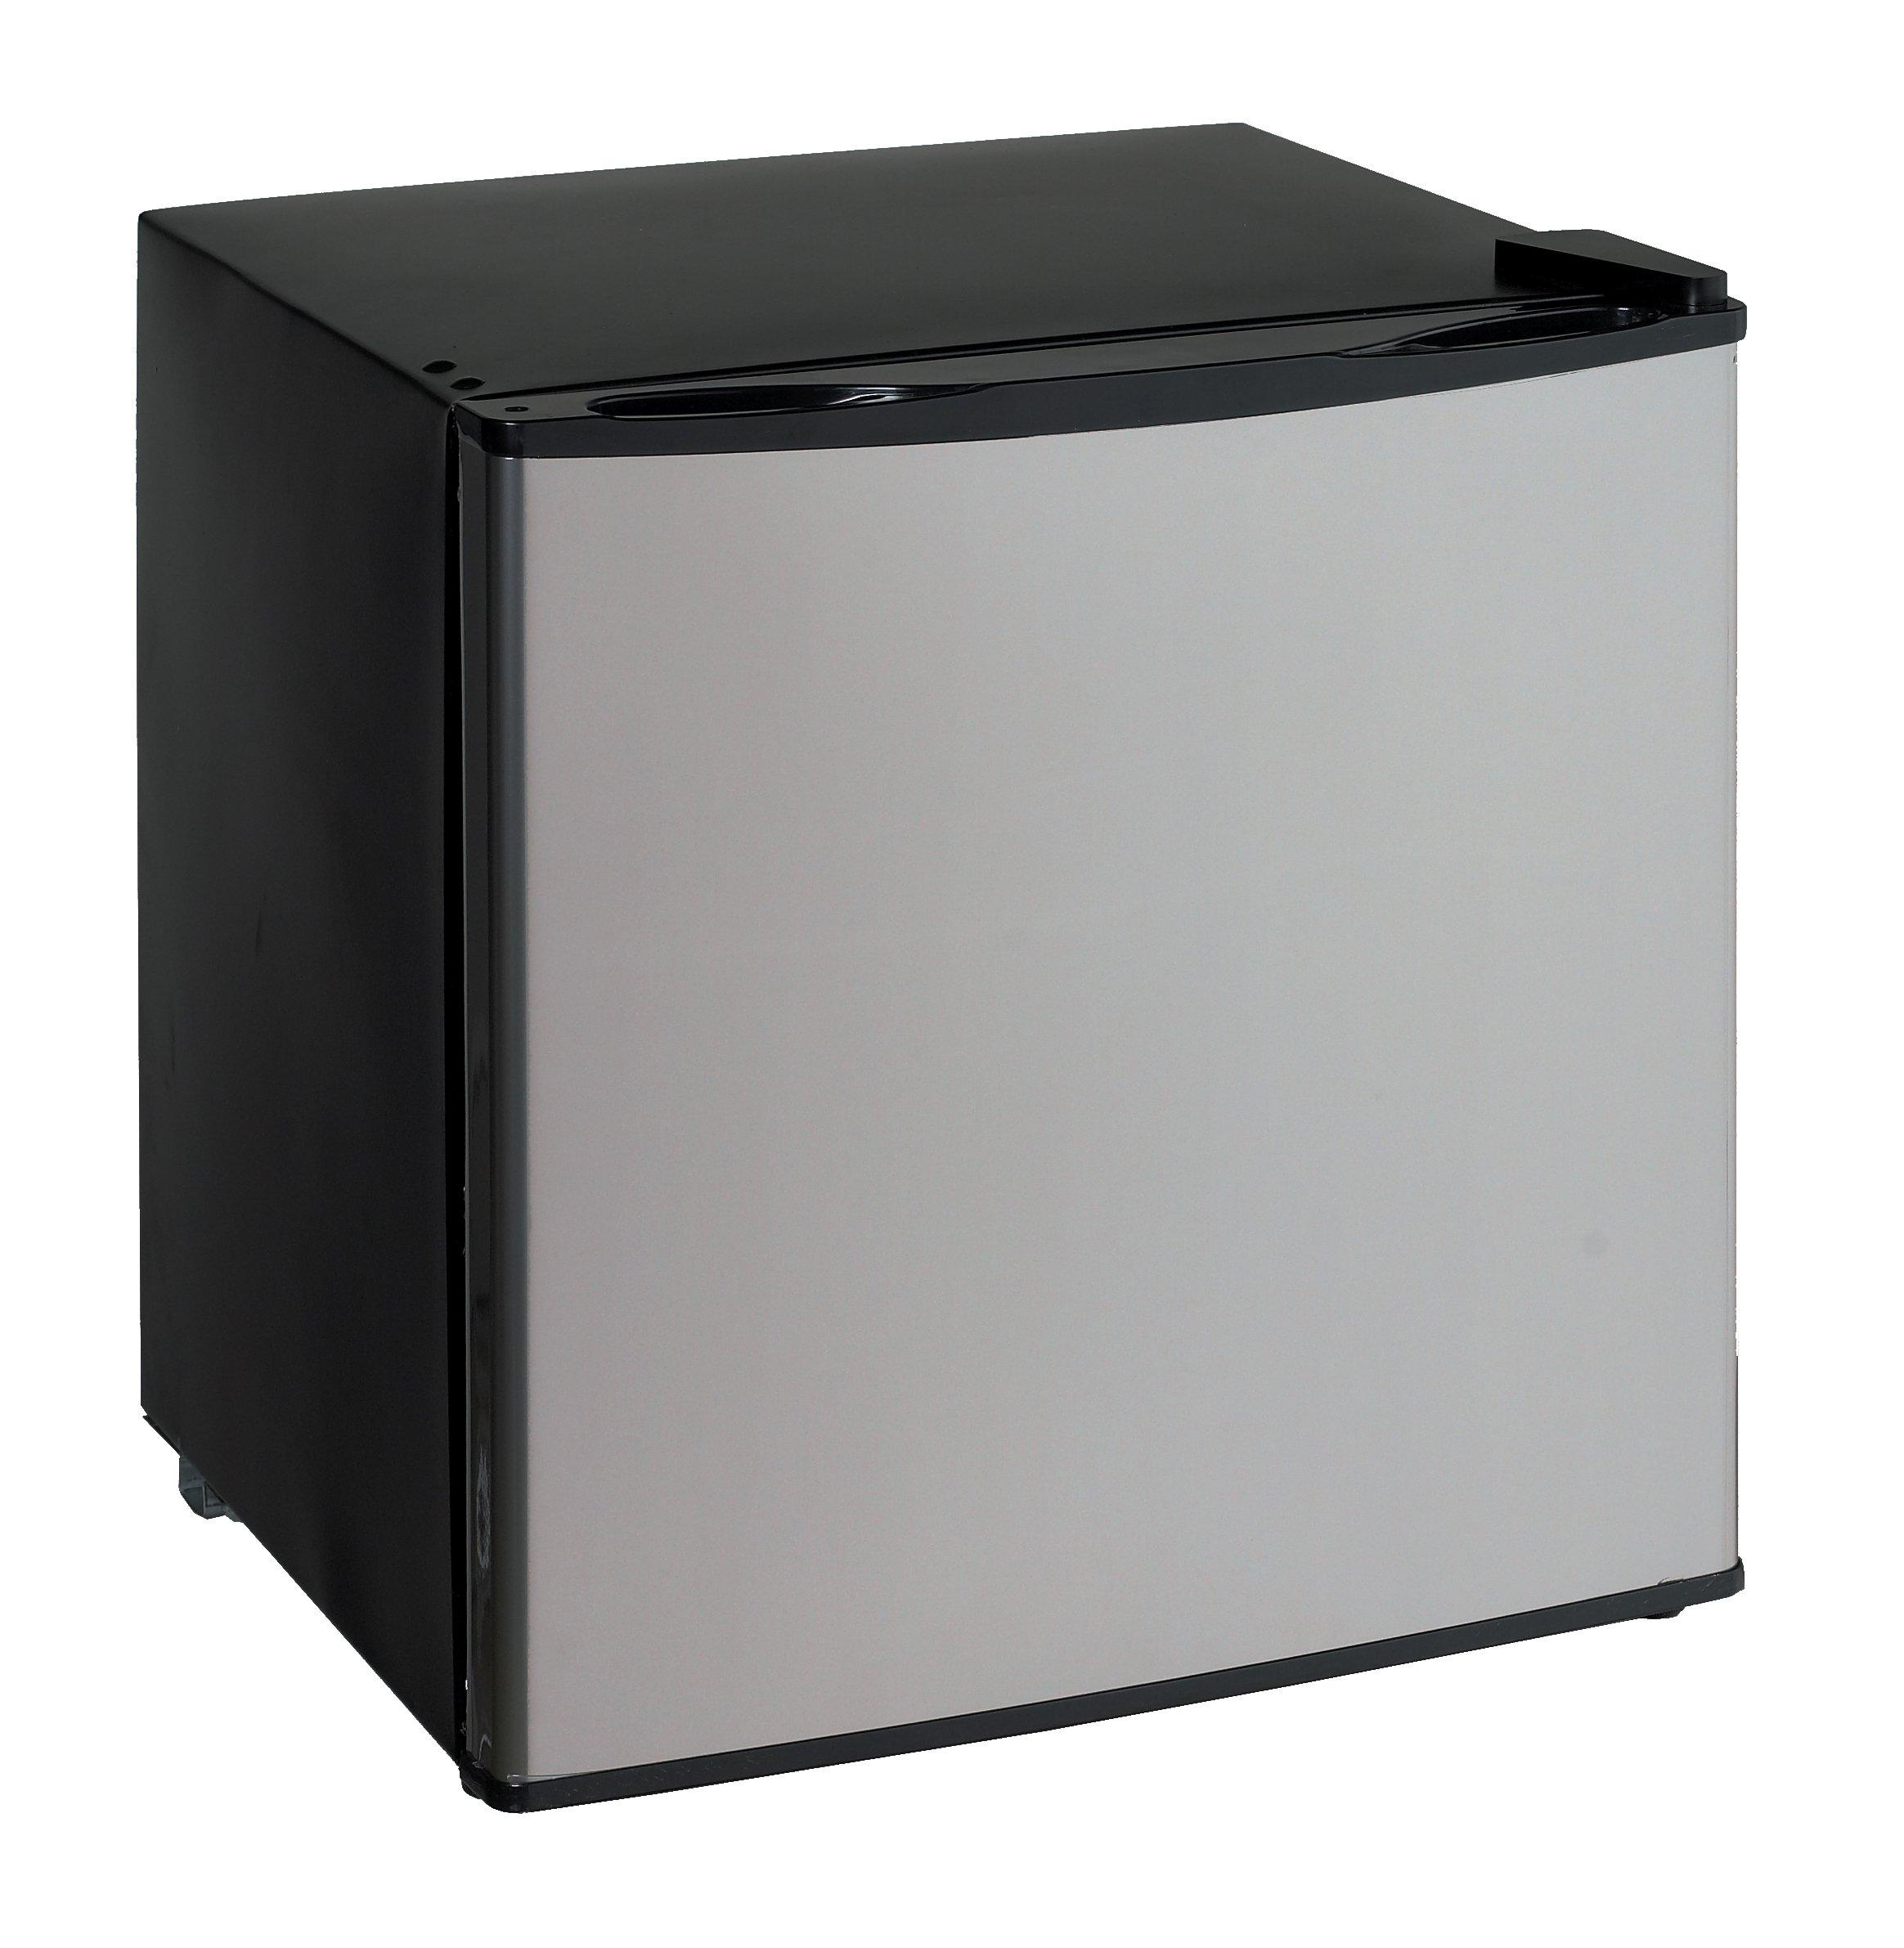 Avanti VFR14PS-IS Dual Switchable Refrigerator/Freezer, 1.4 Cubic Feet